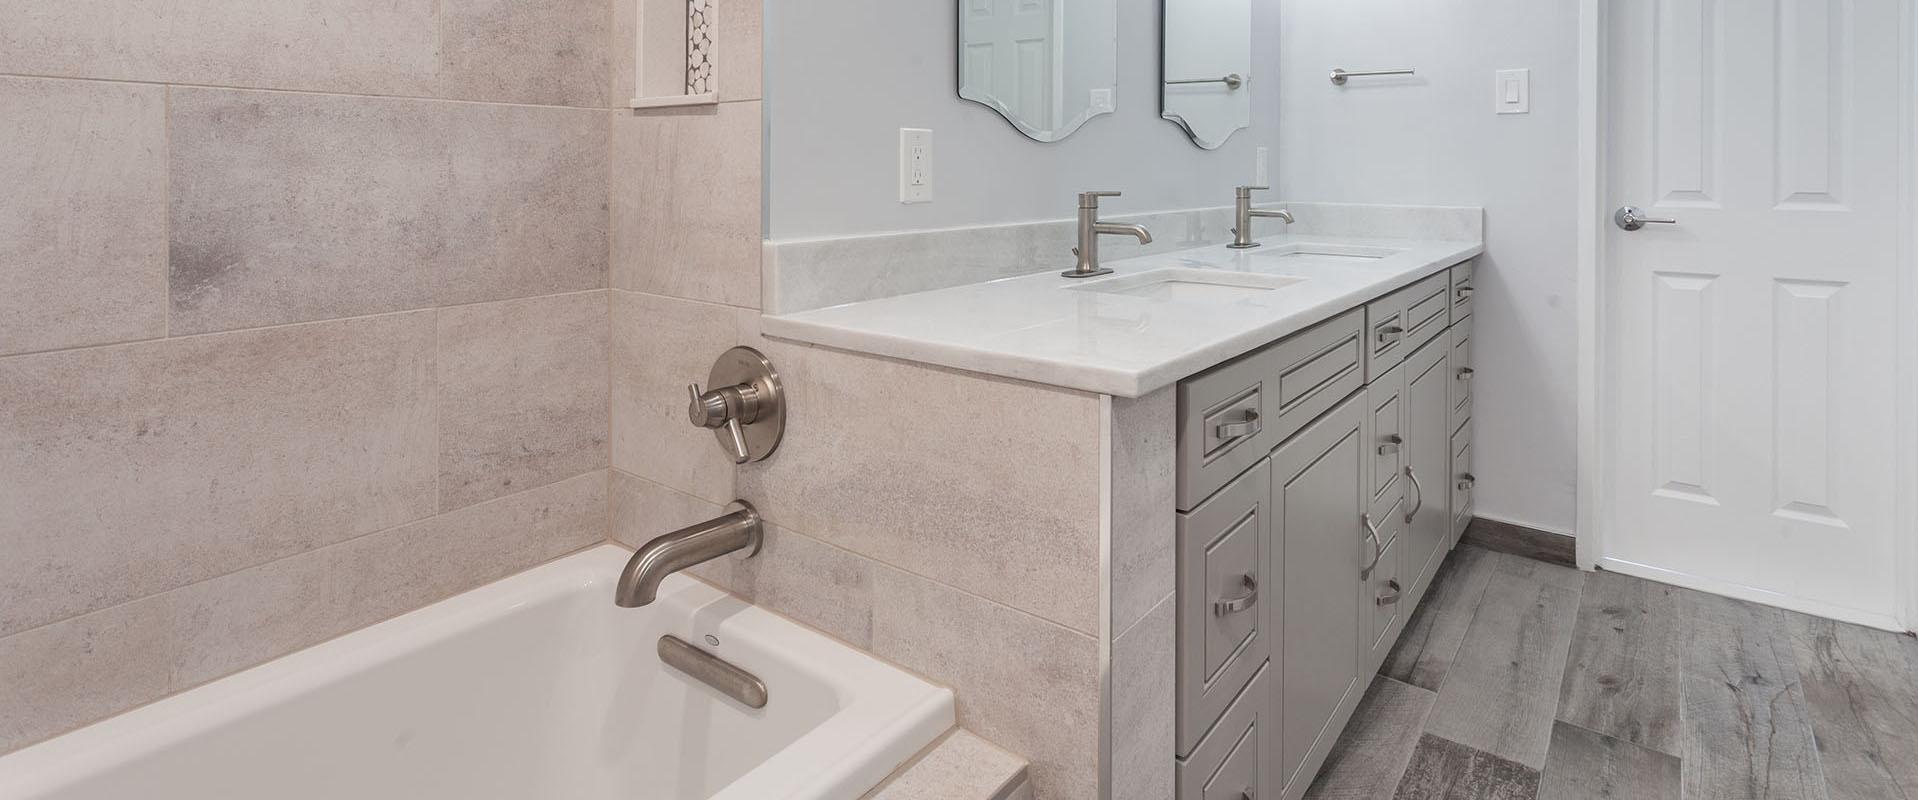 Master Bathroom in Washington, DC